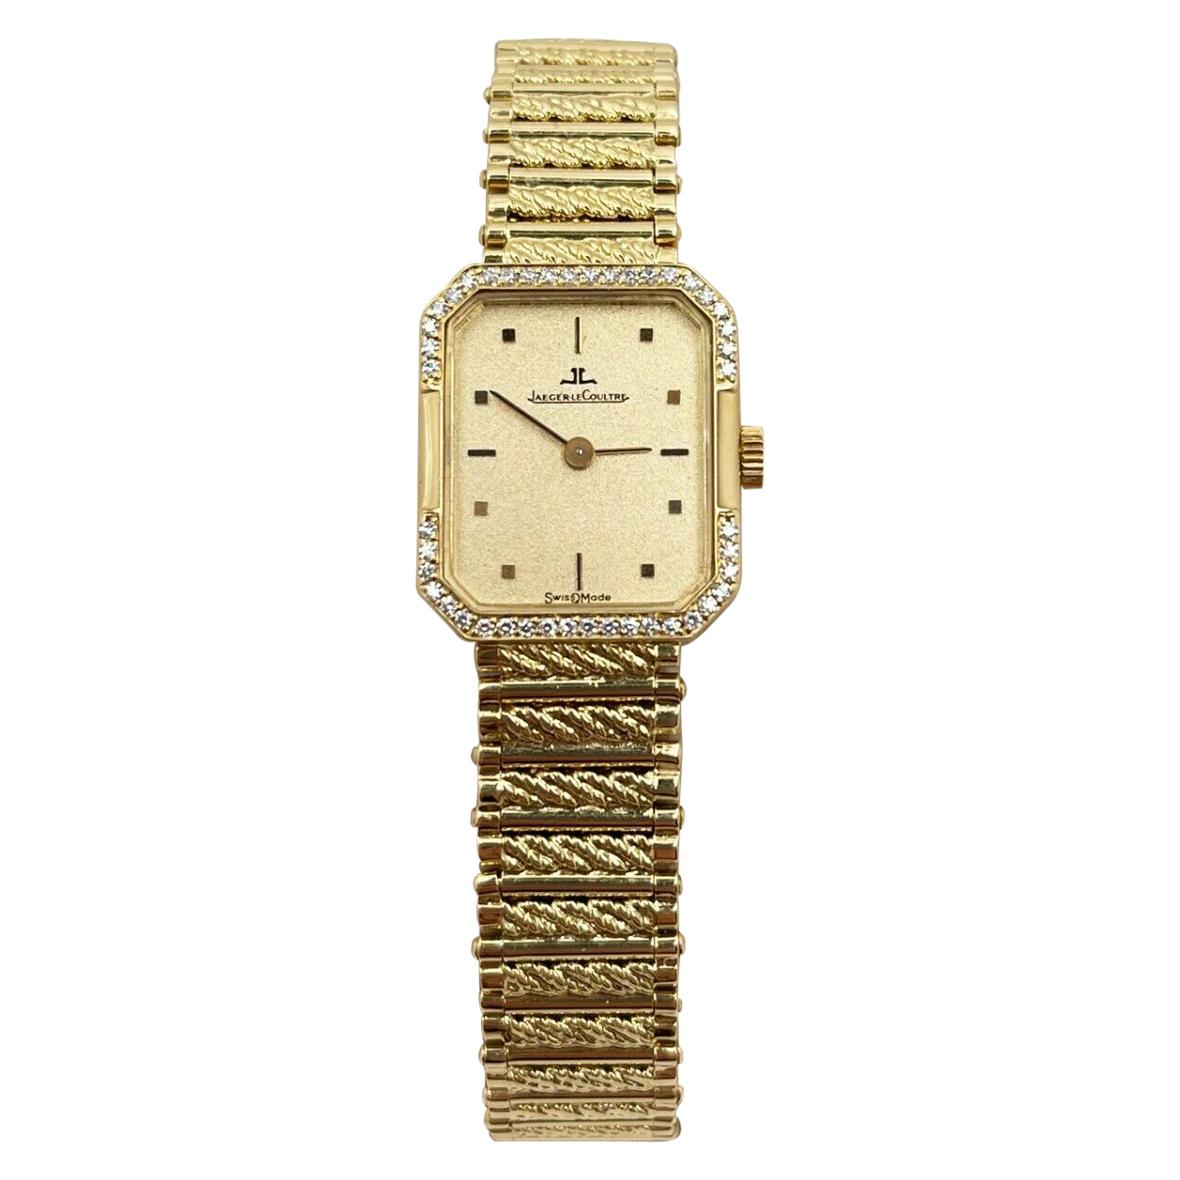 Jaeger-LeCoultre Diamond Bezel Ladies Watch 18 Karat Yellow Gold Watch